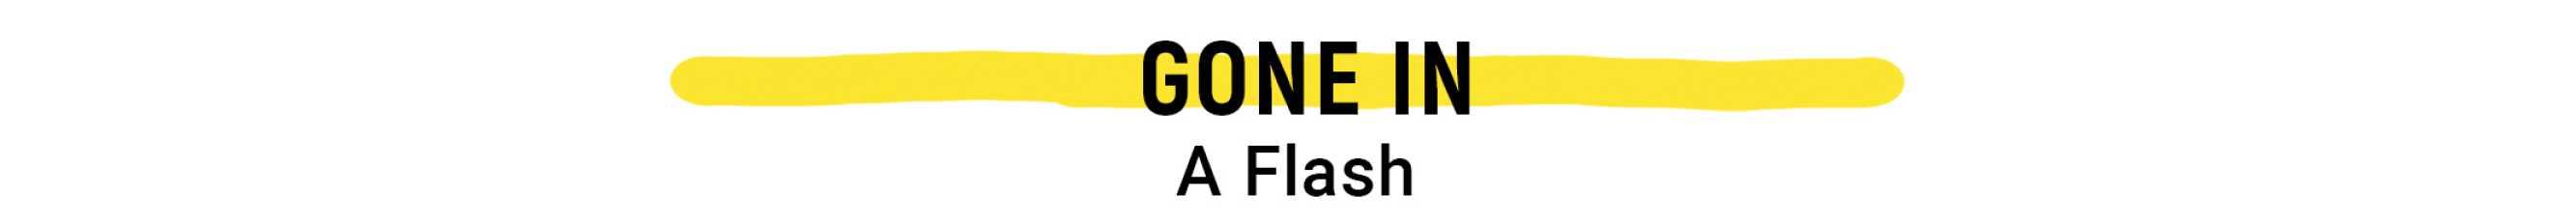 Gone in Flash